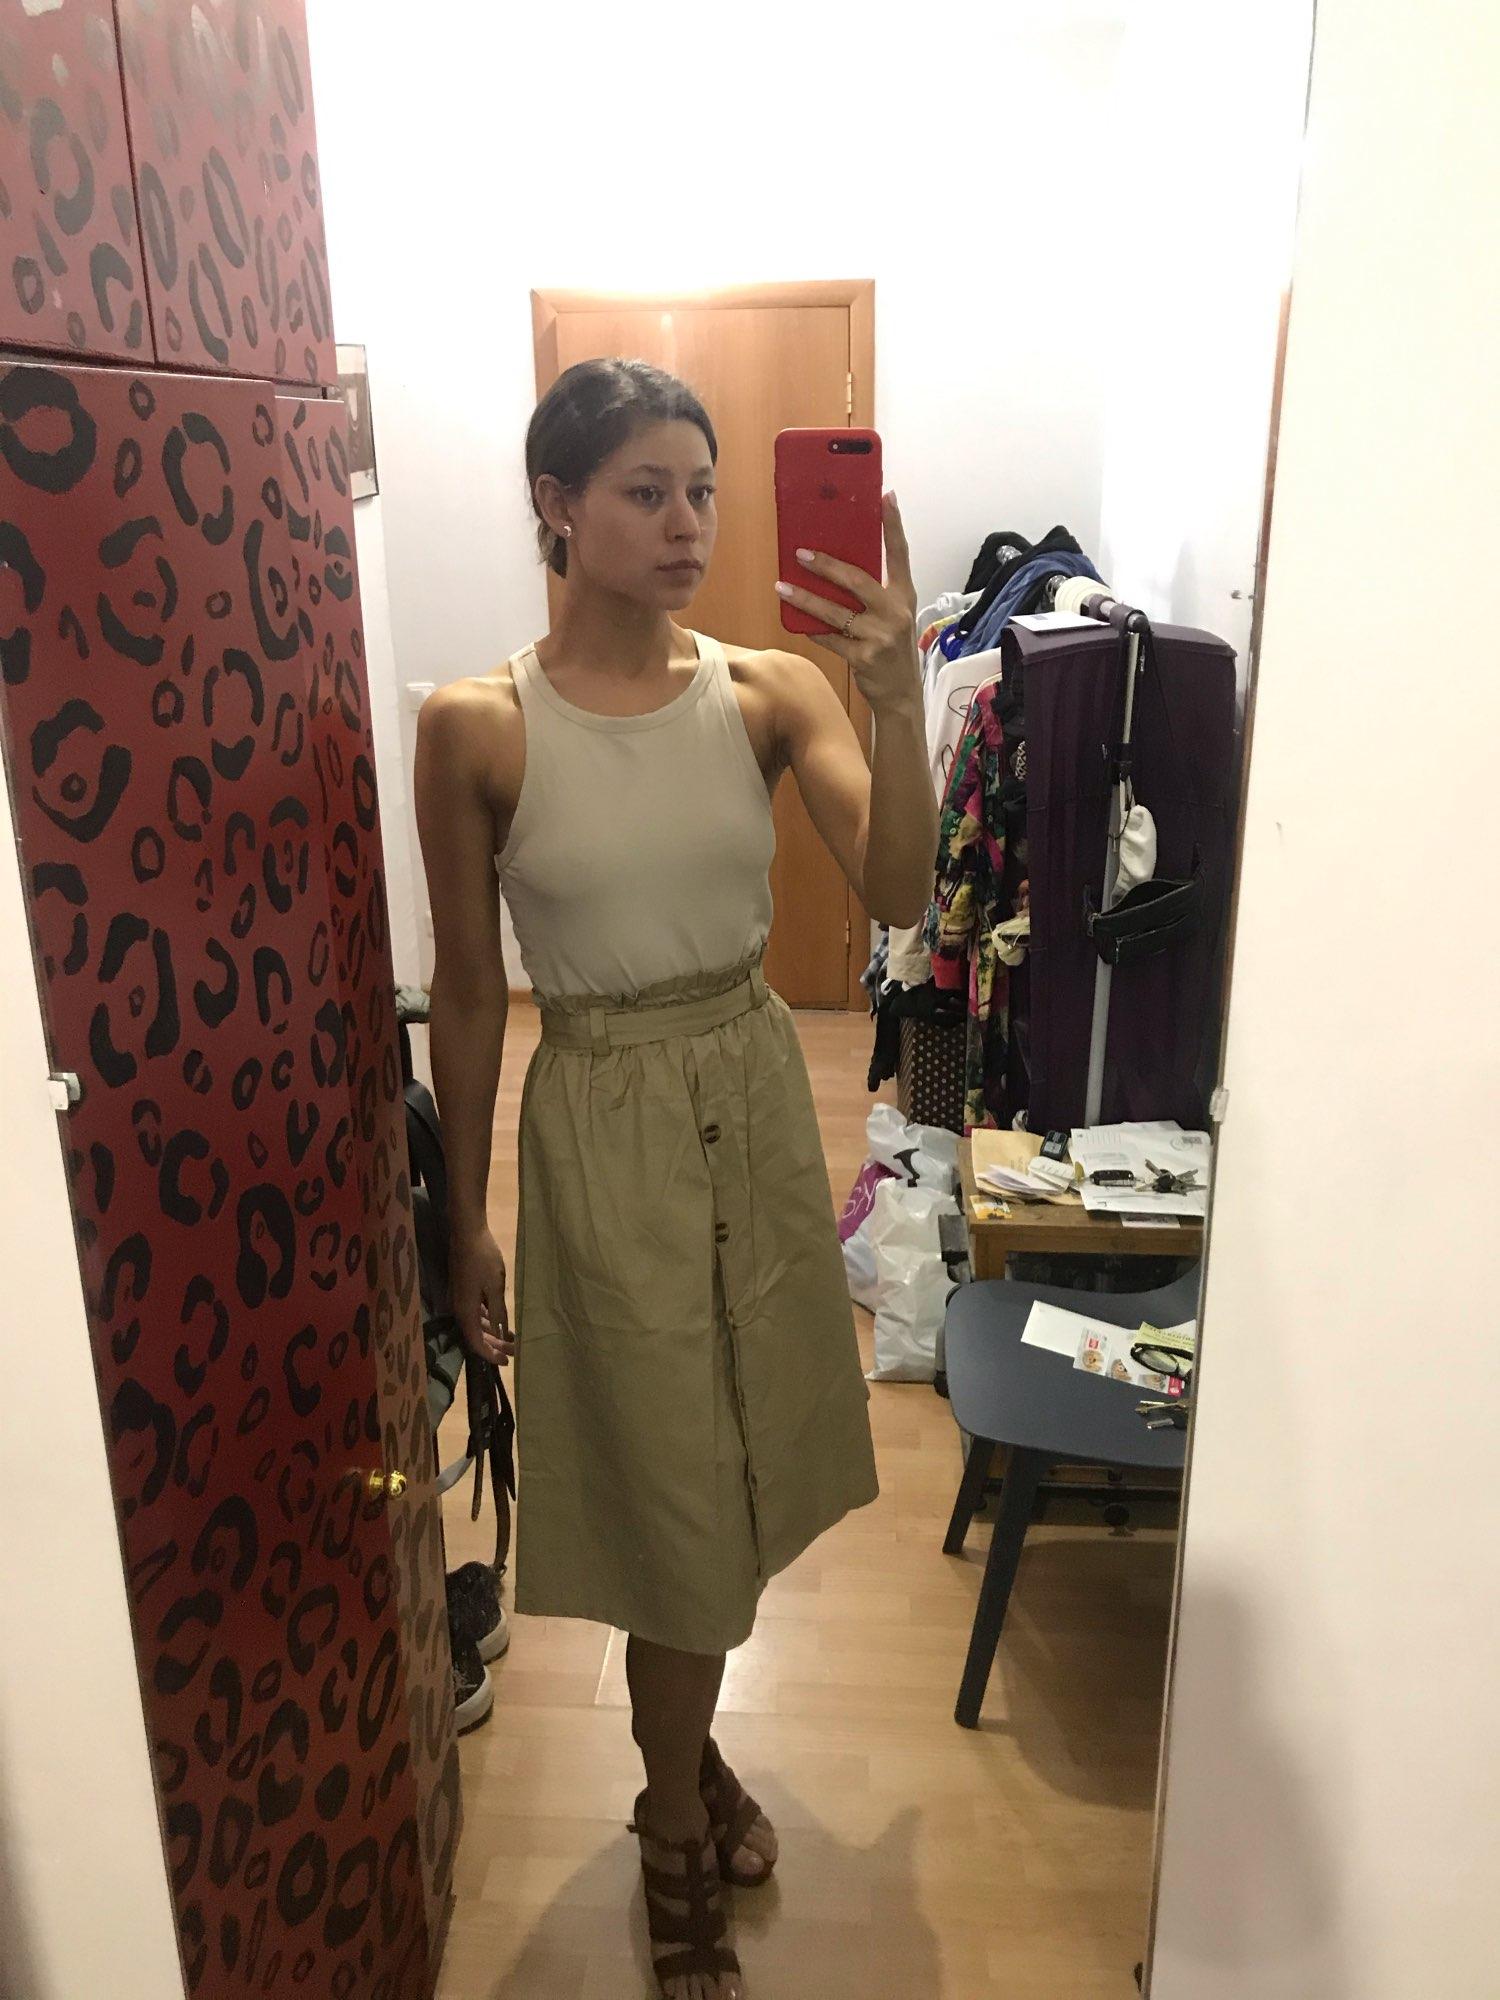 CRRIFLZ Summer Autumn Skirts Womens Midi Knee Length Korean Elegant Button High Waist Skirt Female Pleated School Skirt Skirts    - AliExpress